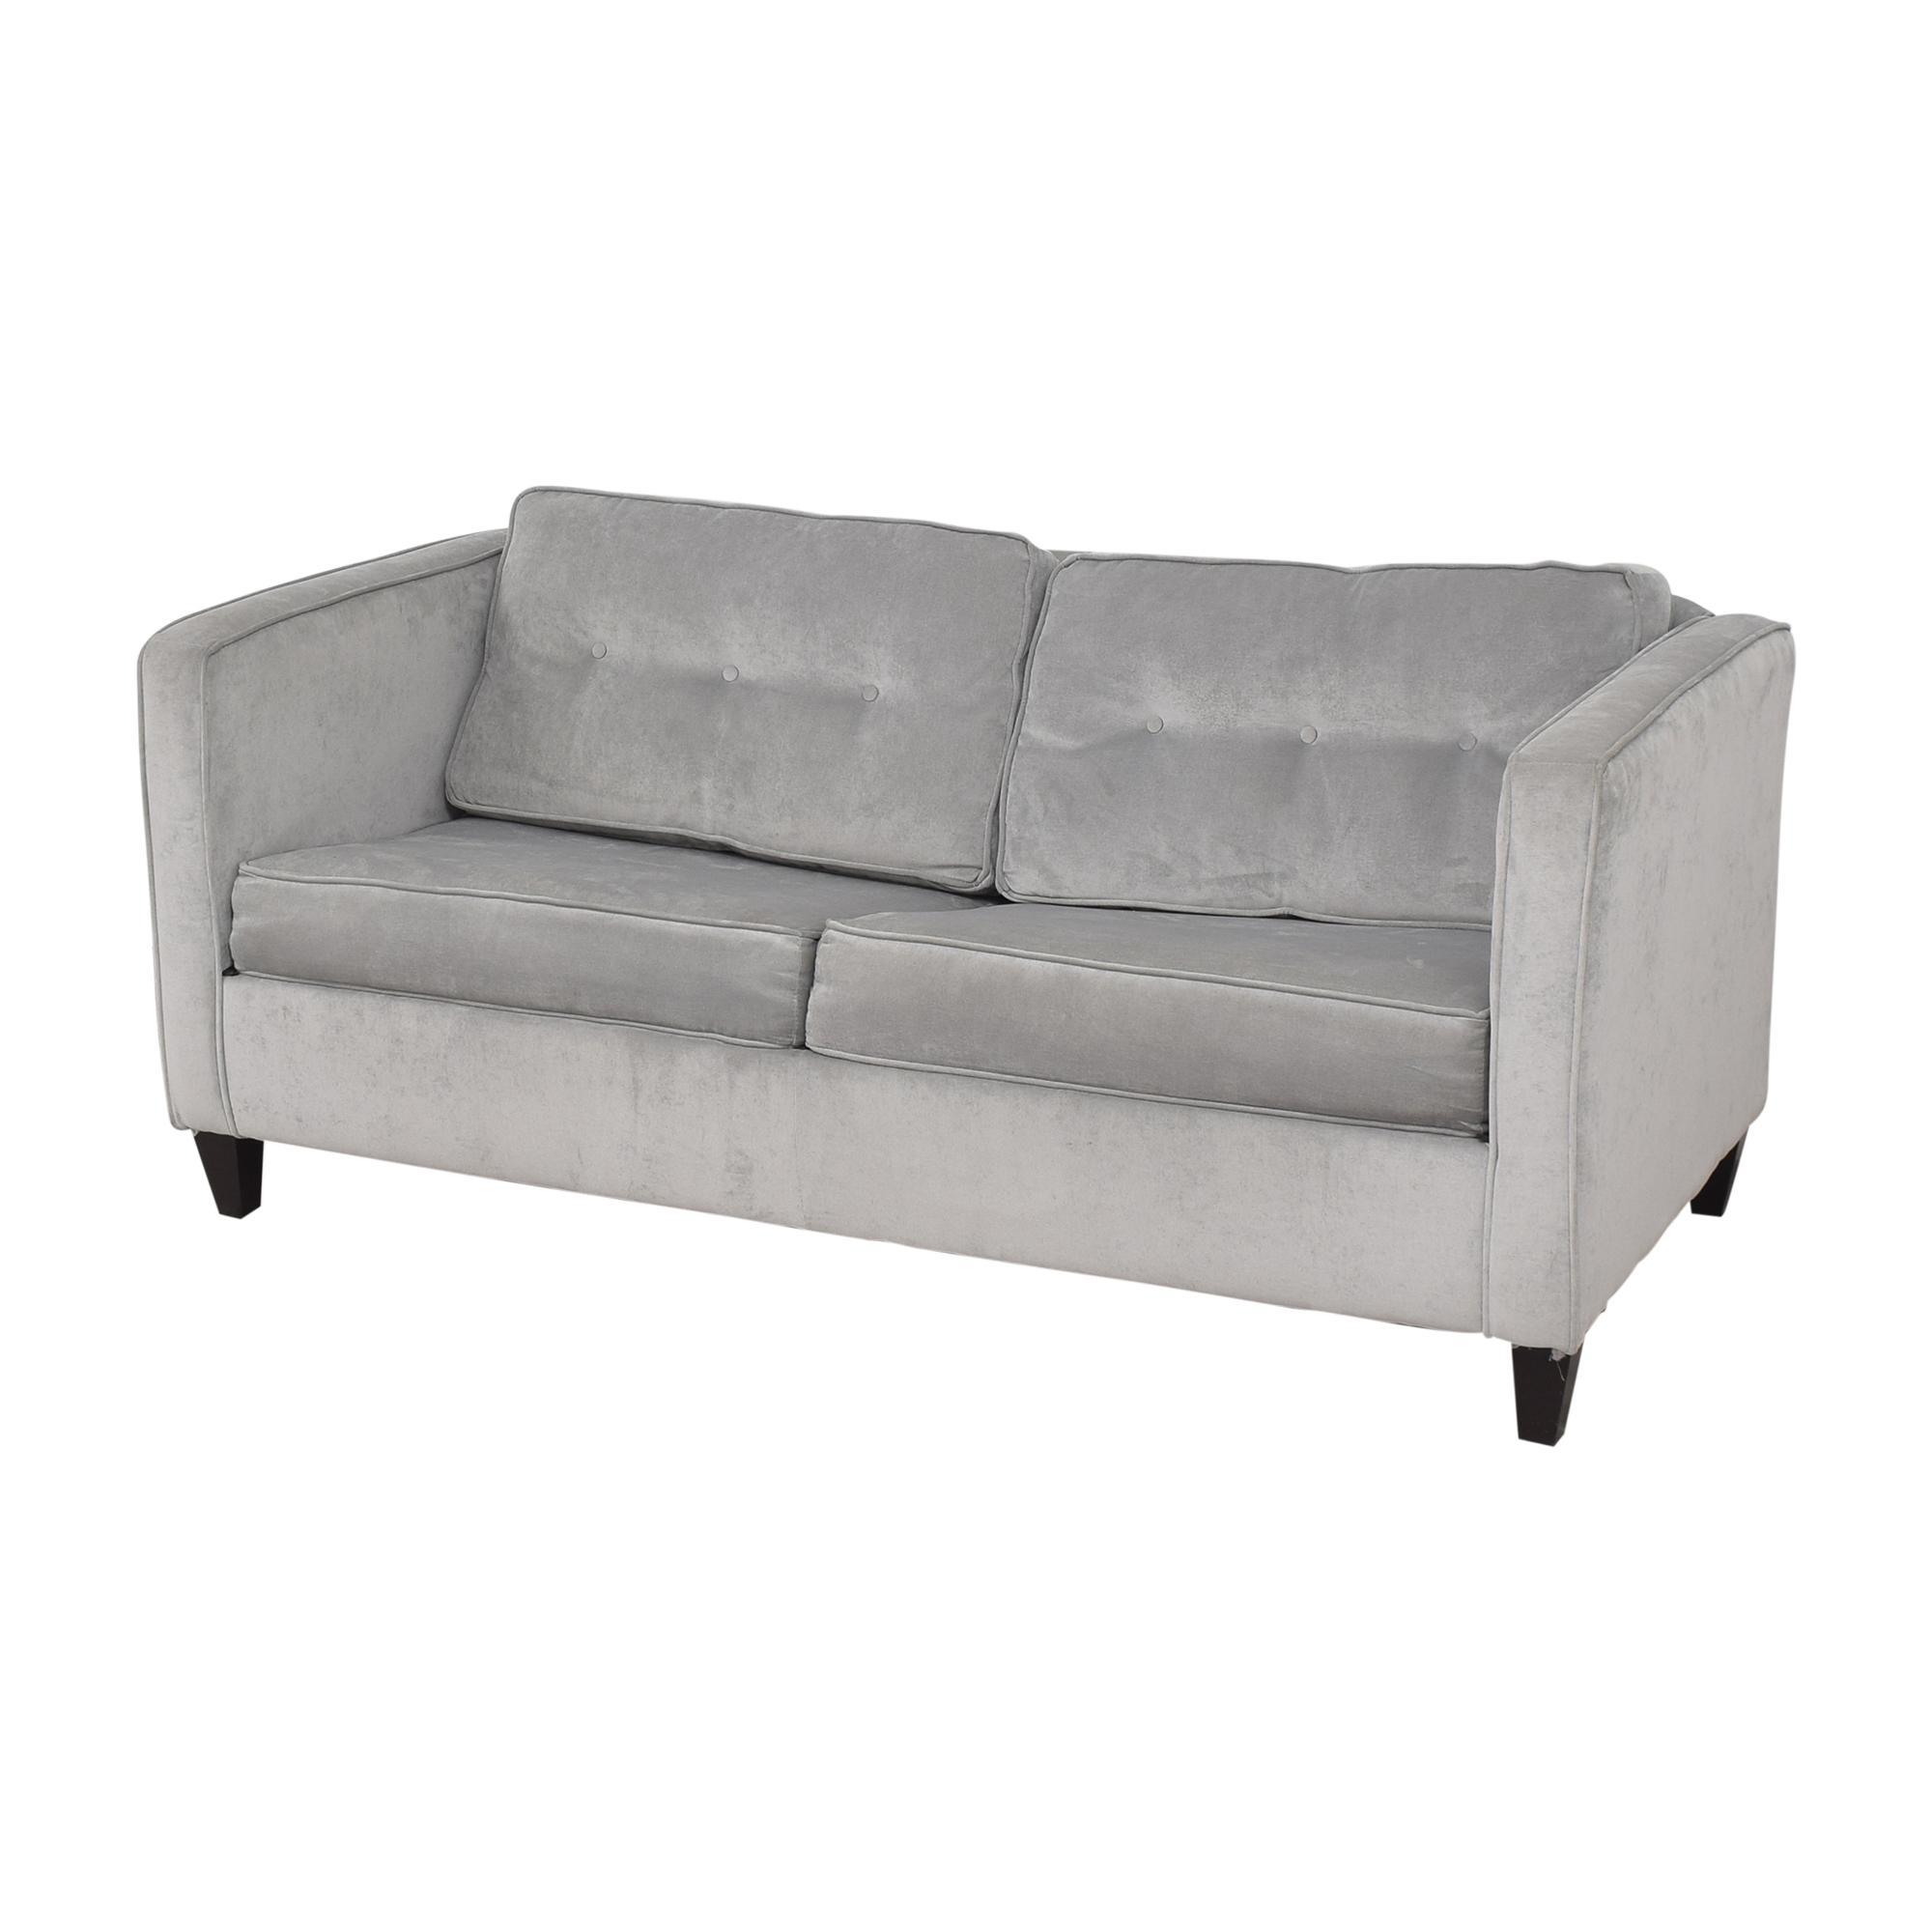 buy Wayfair Ebern Designs Dengler Square Arm Sleeper Sofa Wayfair Sofa Beds